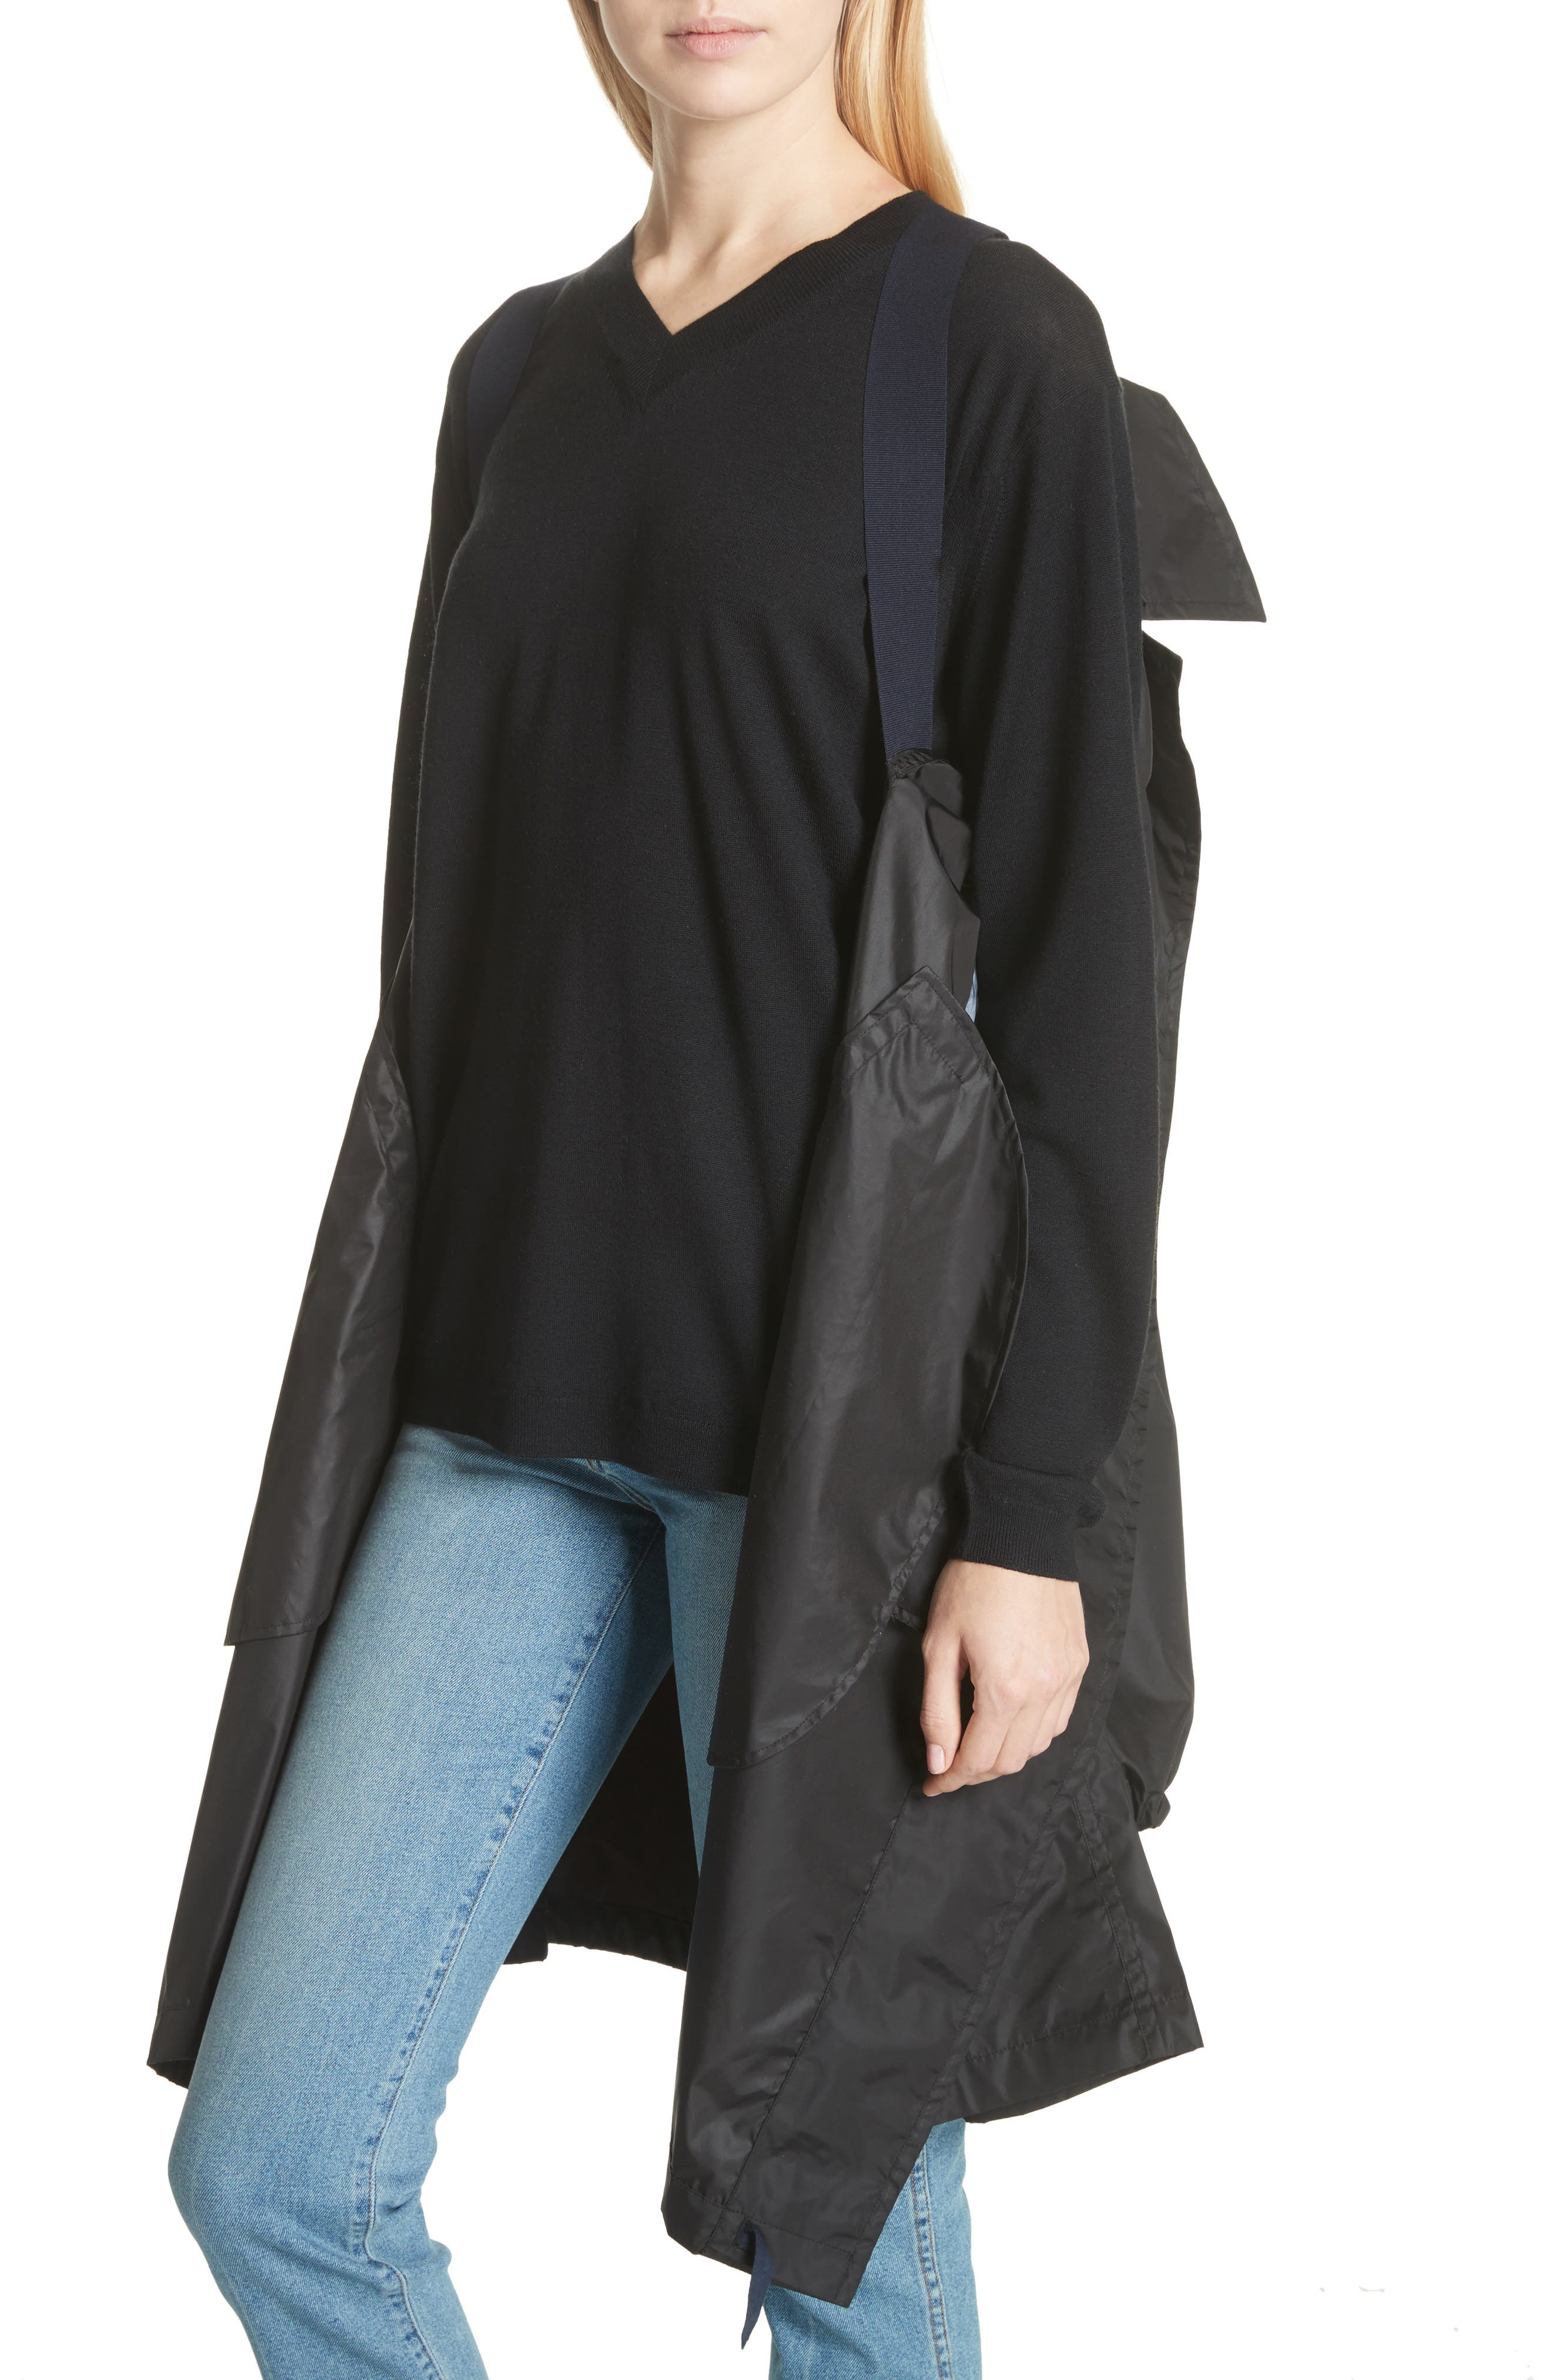 Raincoat with Inside Suspenders,                             Alternate thumbnail 2, color,                             Black